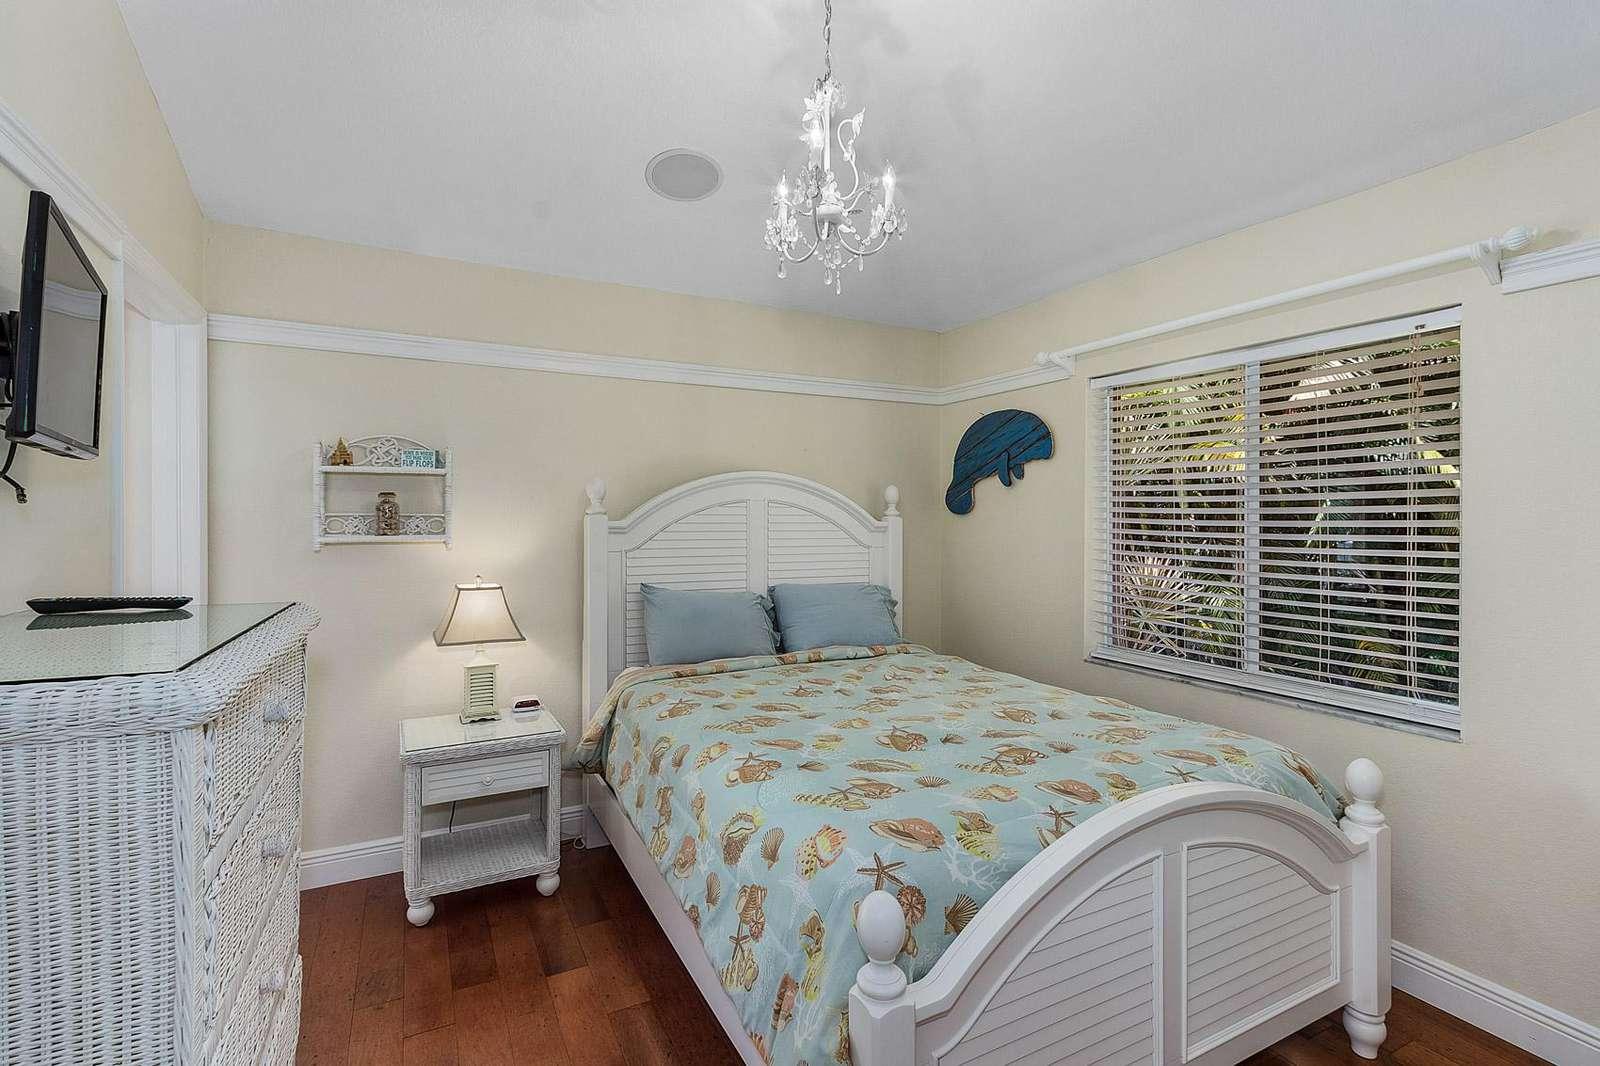 Bedroom 2 with quen bed